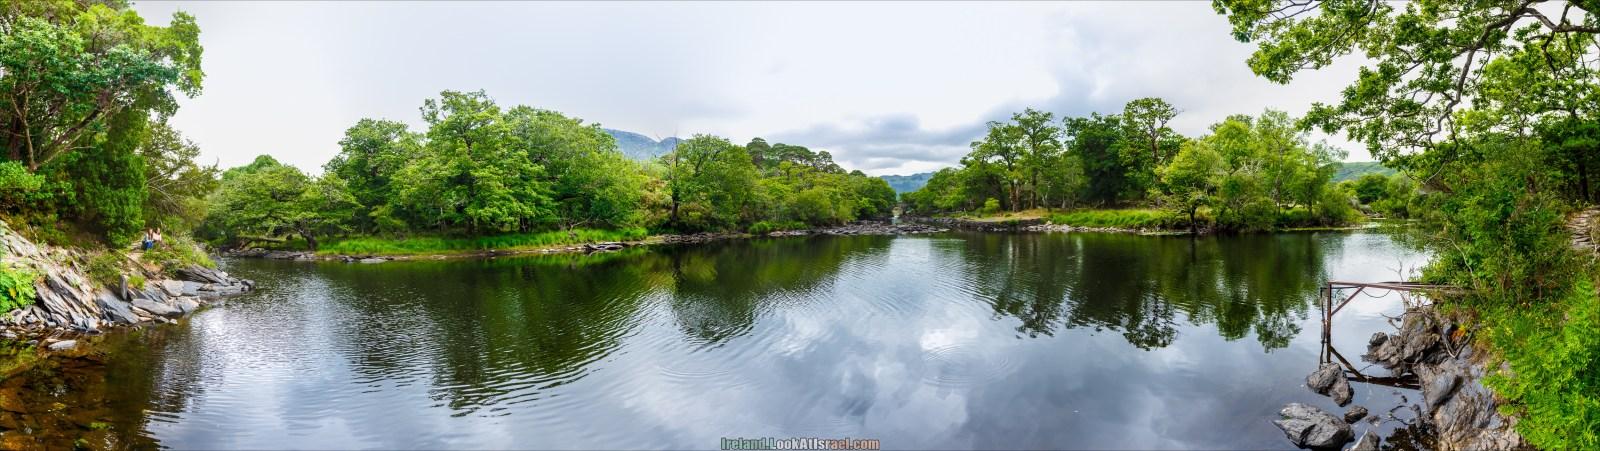 Кольцо Керри, Парк Килларни, Встреча вод трех озер | The Ring of Kerry, Killareny Park, Meeting waters, Lough Leane, Mukcross lake, Upper lake | LookAtIsrael.com путешествует по Ирландии